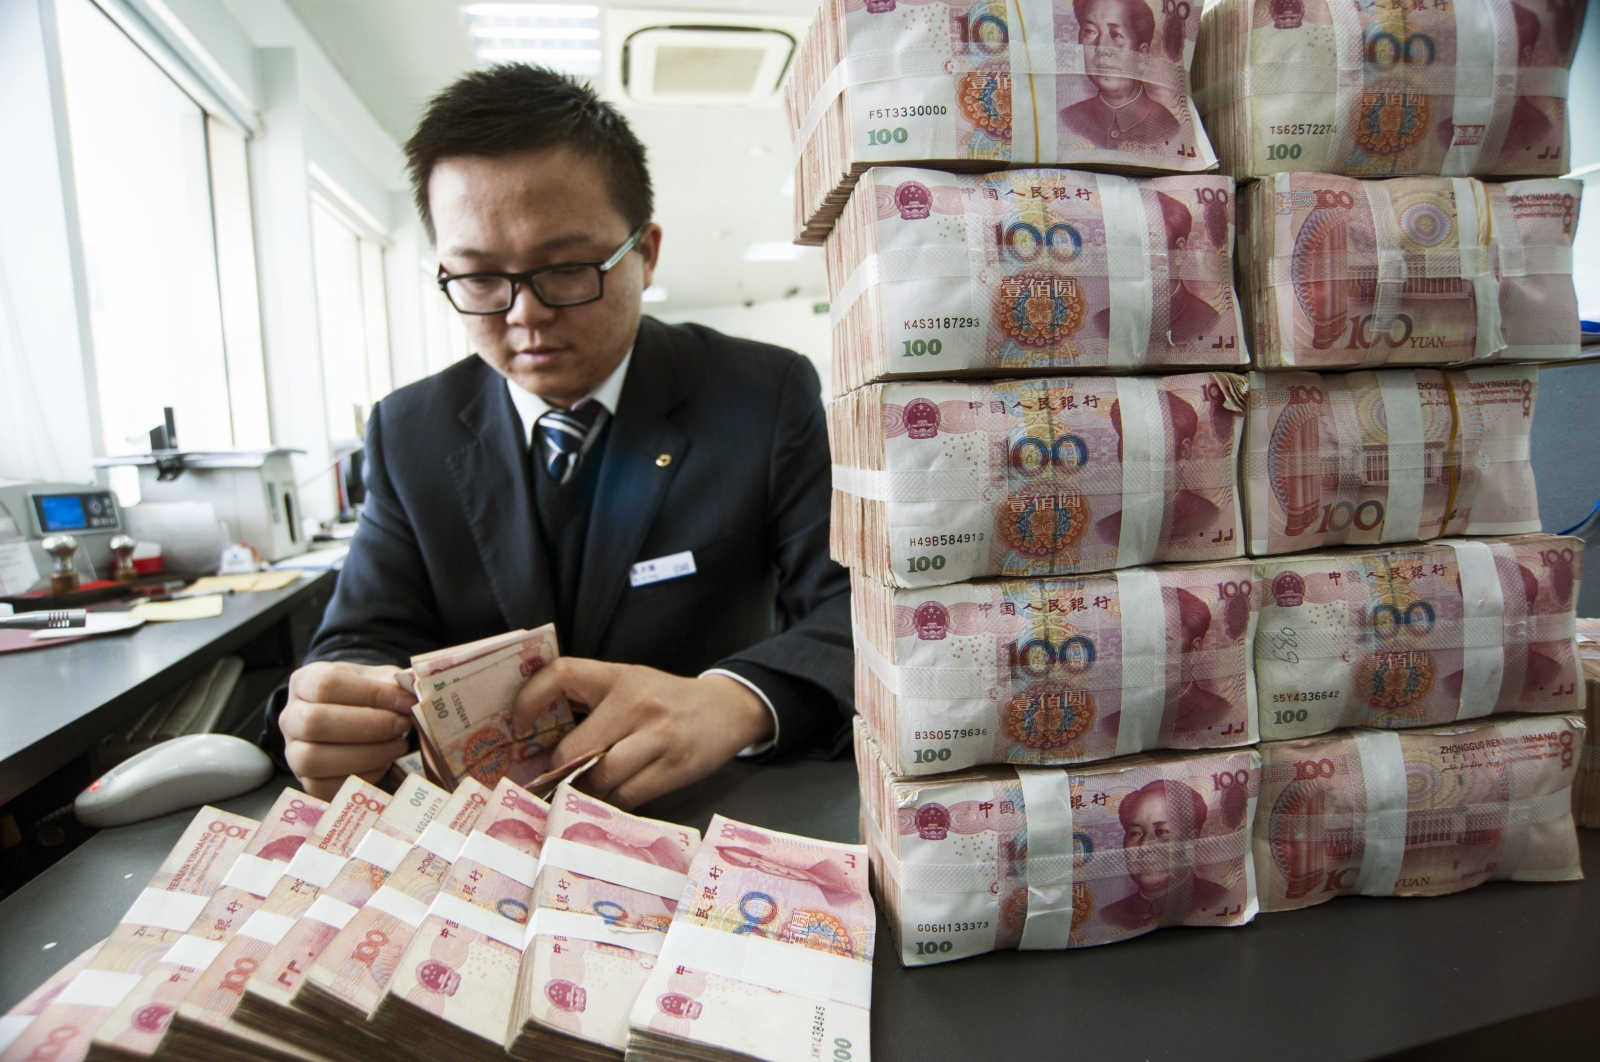 A clerk counts Chinese 100 yuan banknotes at a branch of China Construction Bank